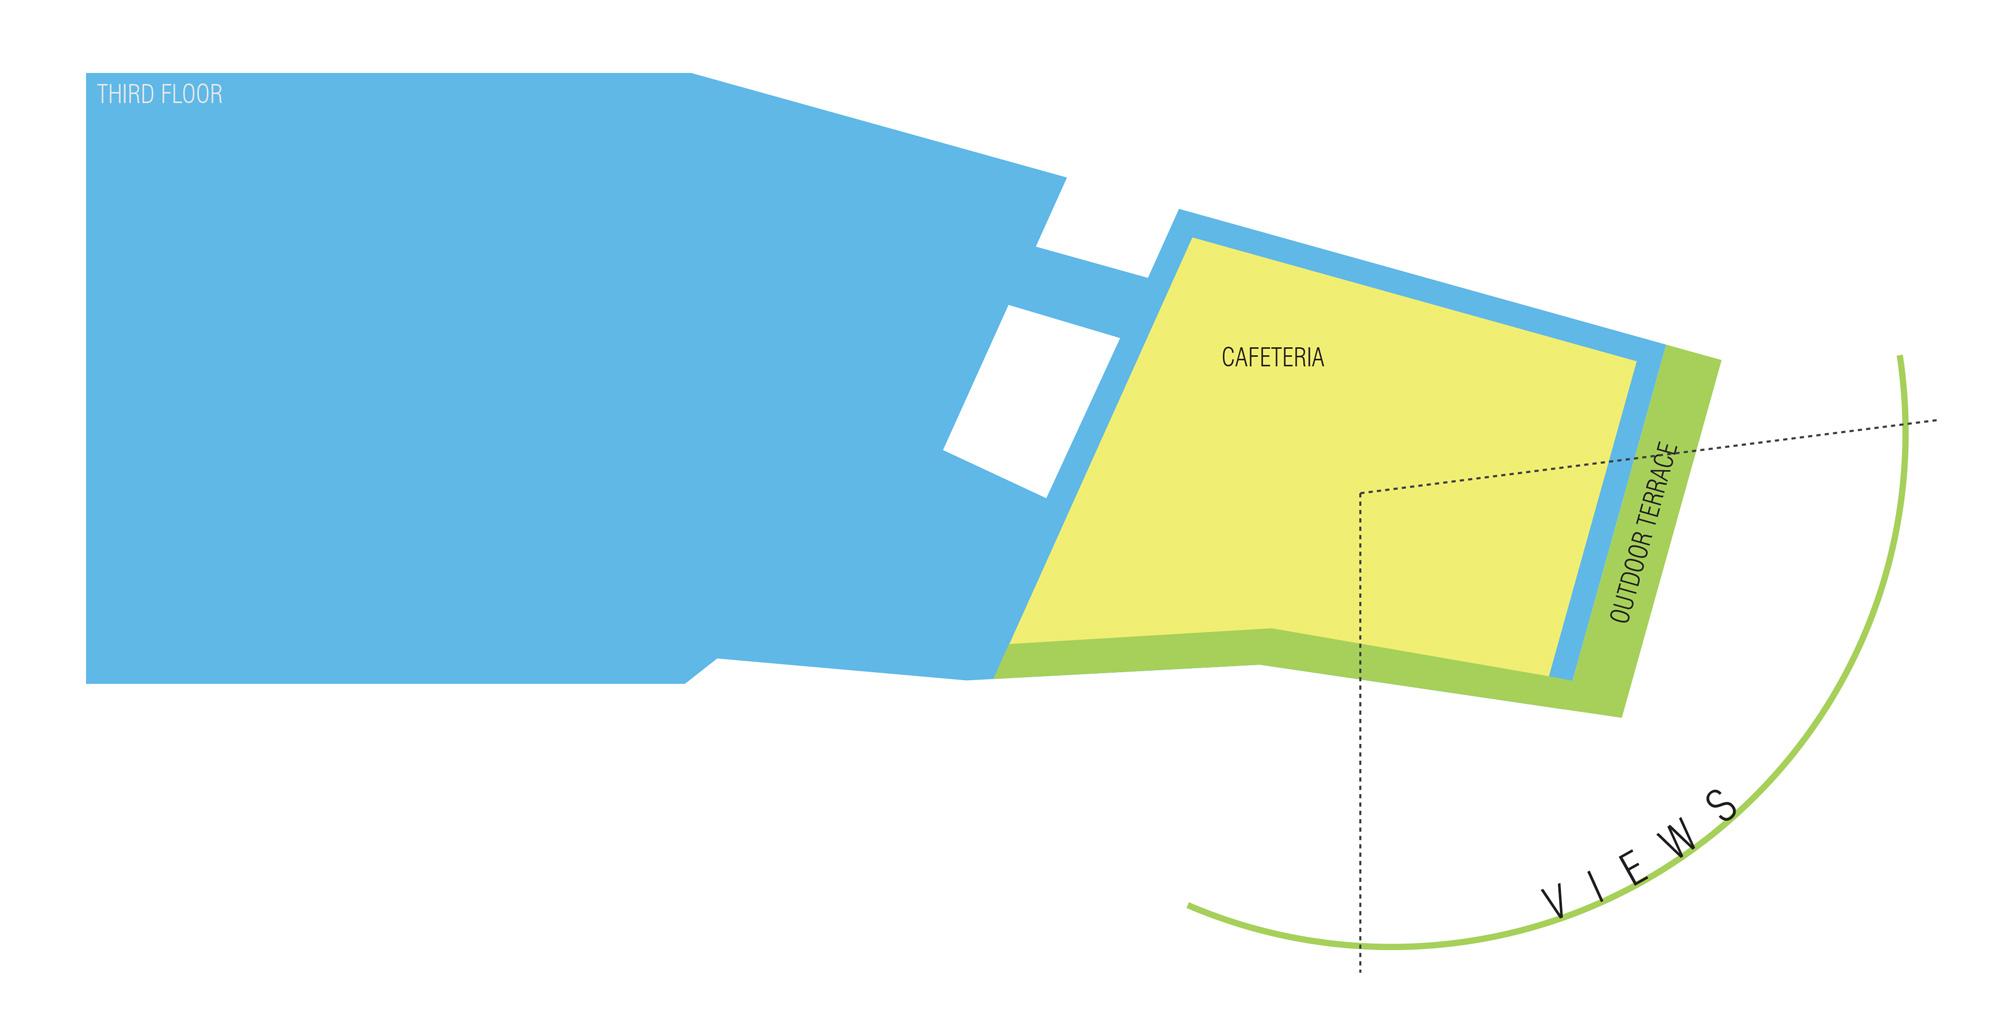 Diagramma © Shinberg.Levinas Architects